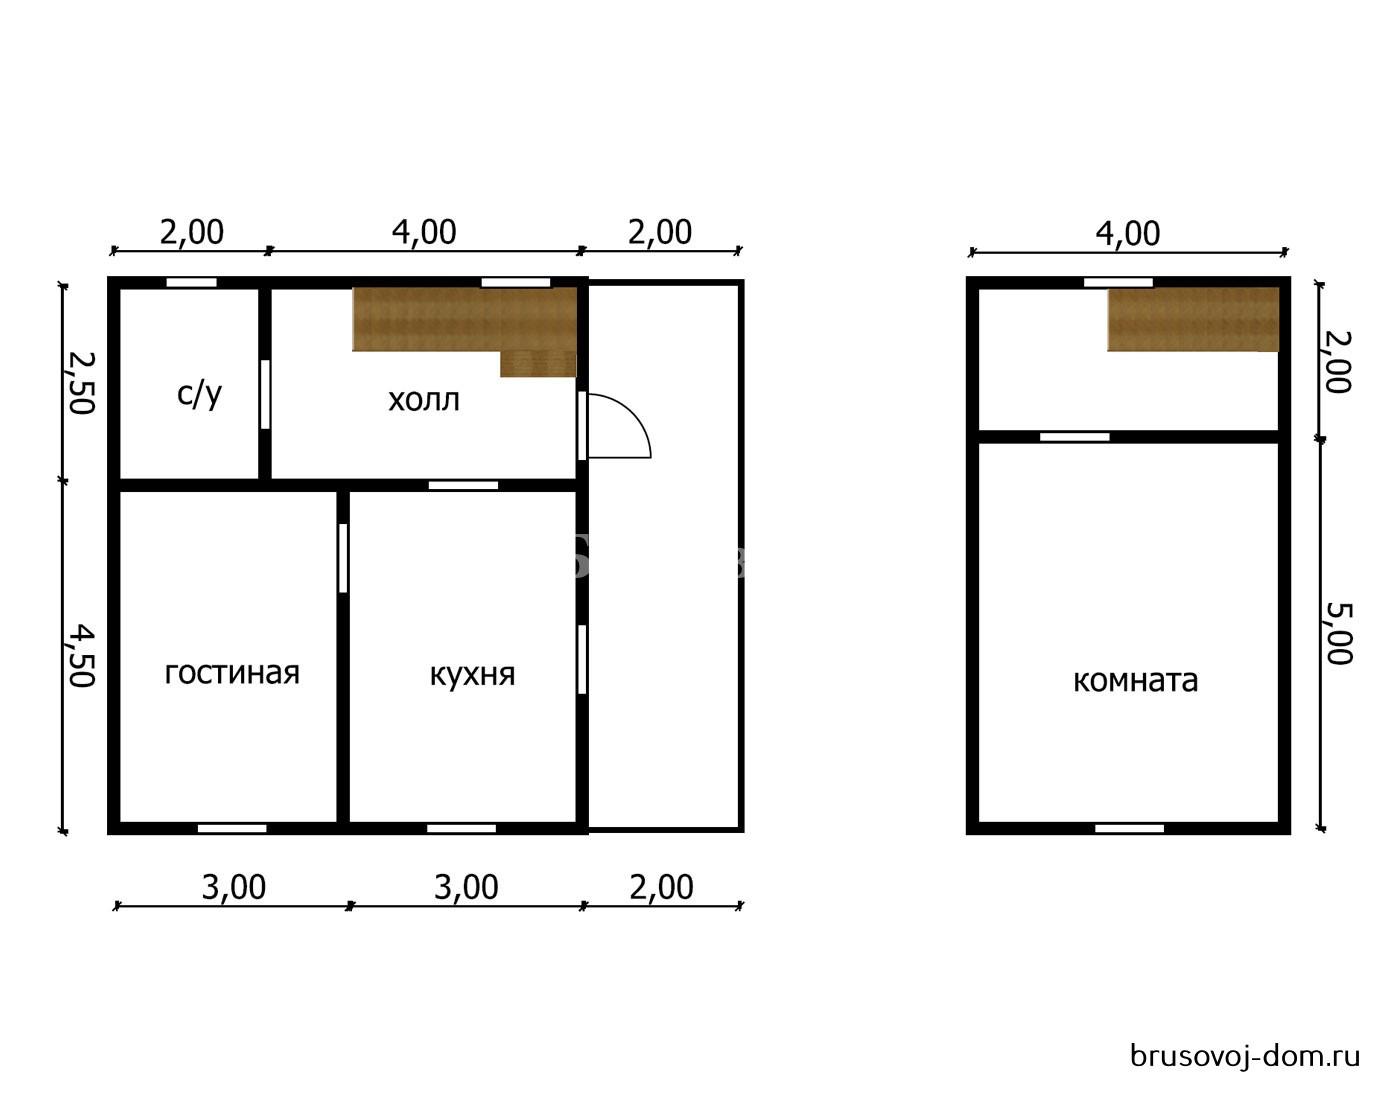 Дом под усадку 7х8 м Мурино